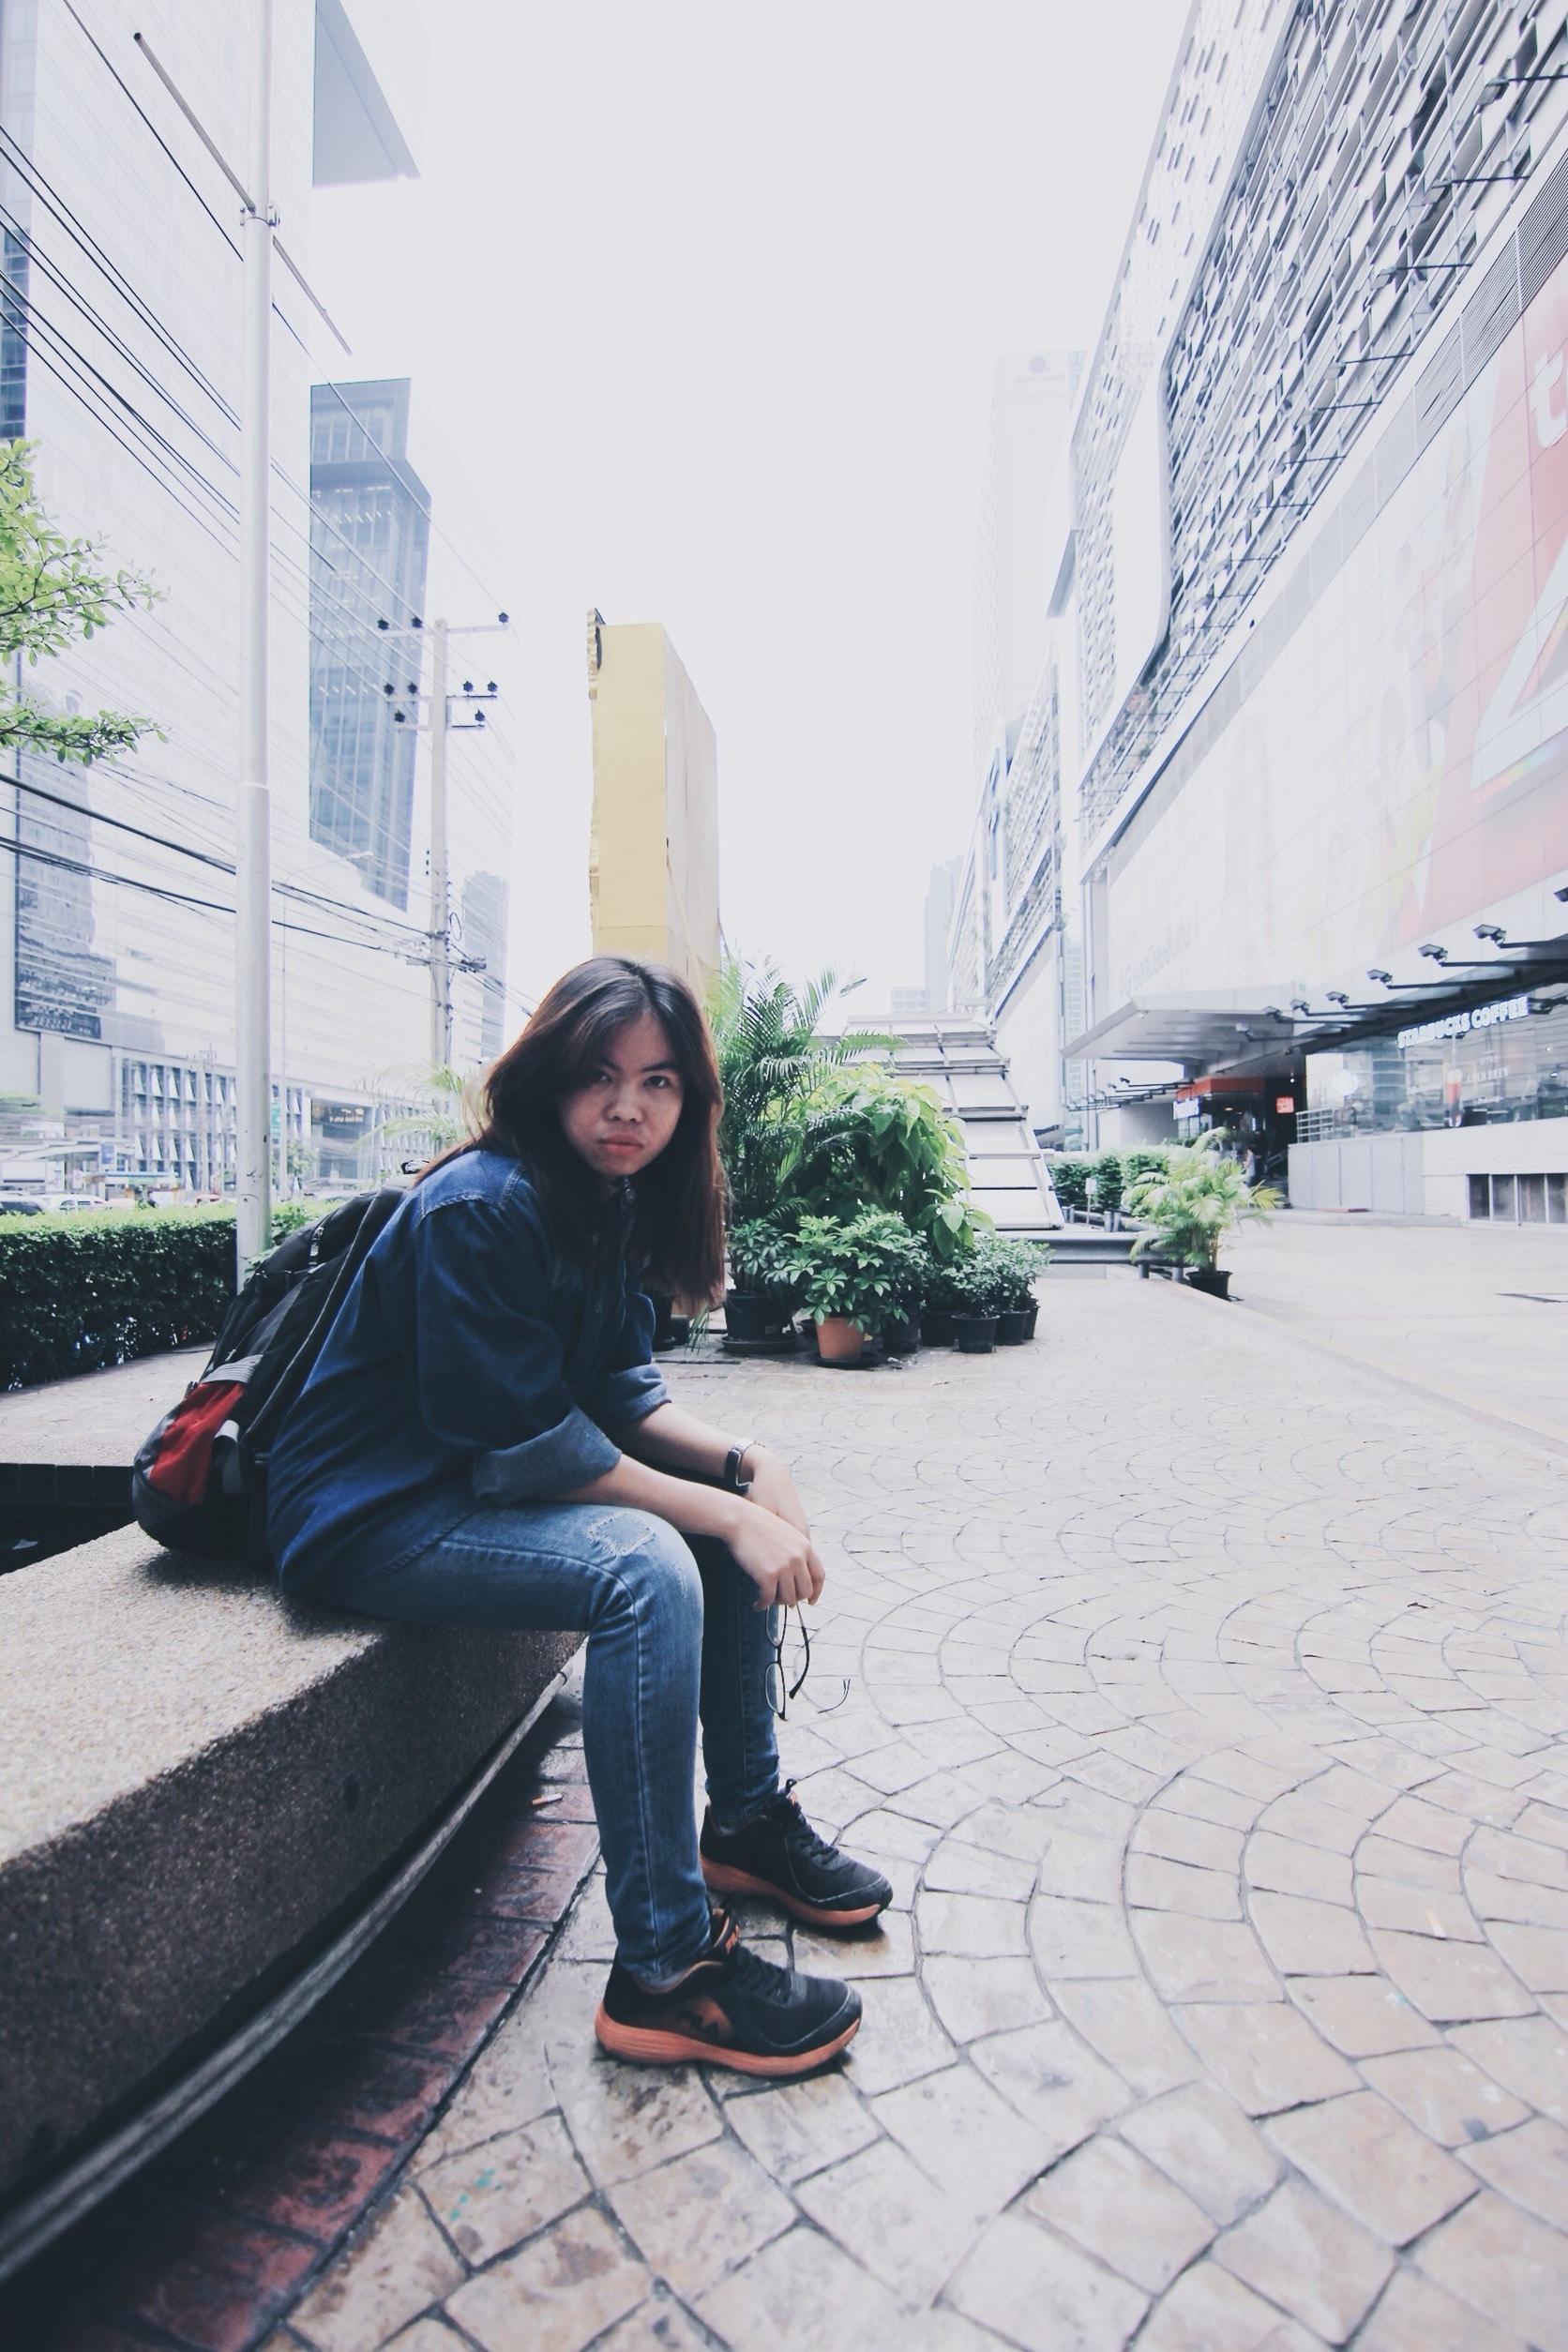 Go to Duangphorn Wiriya's profile